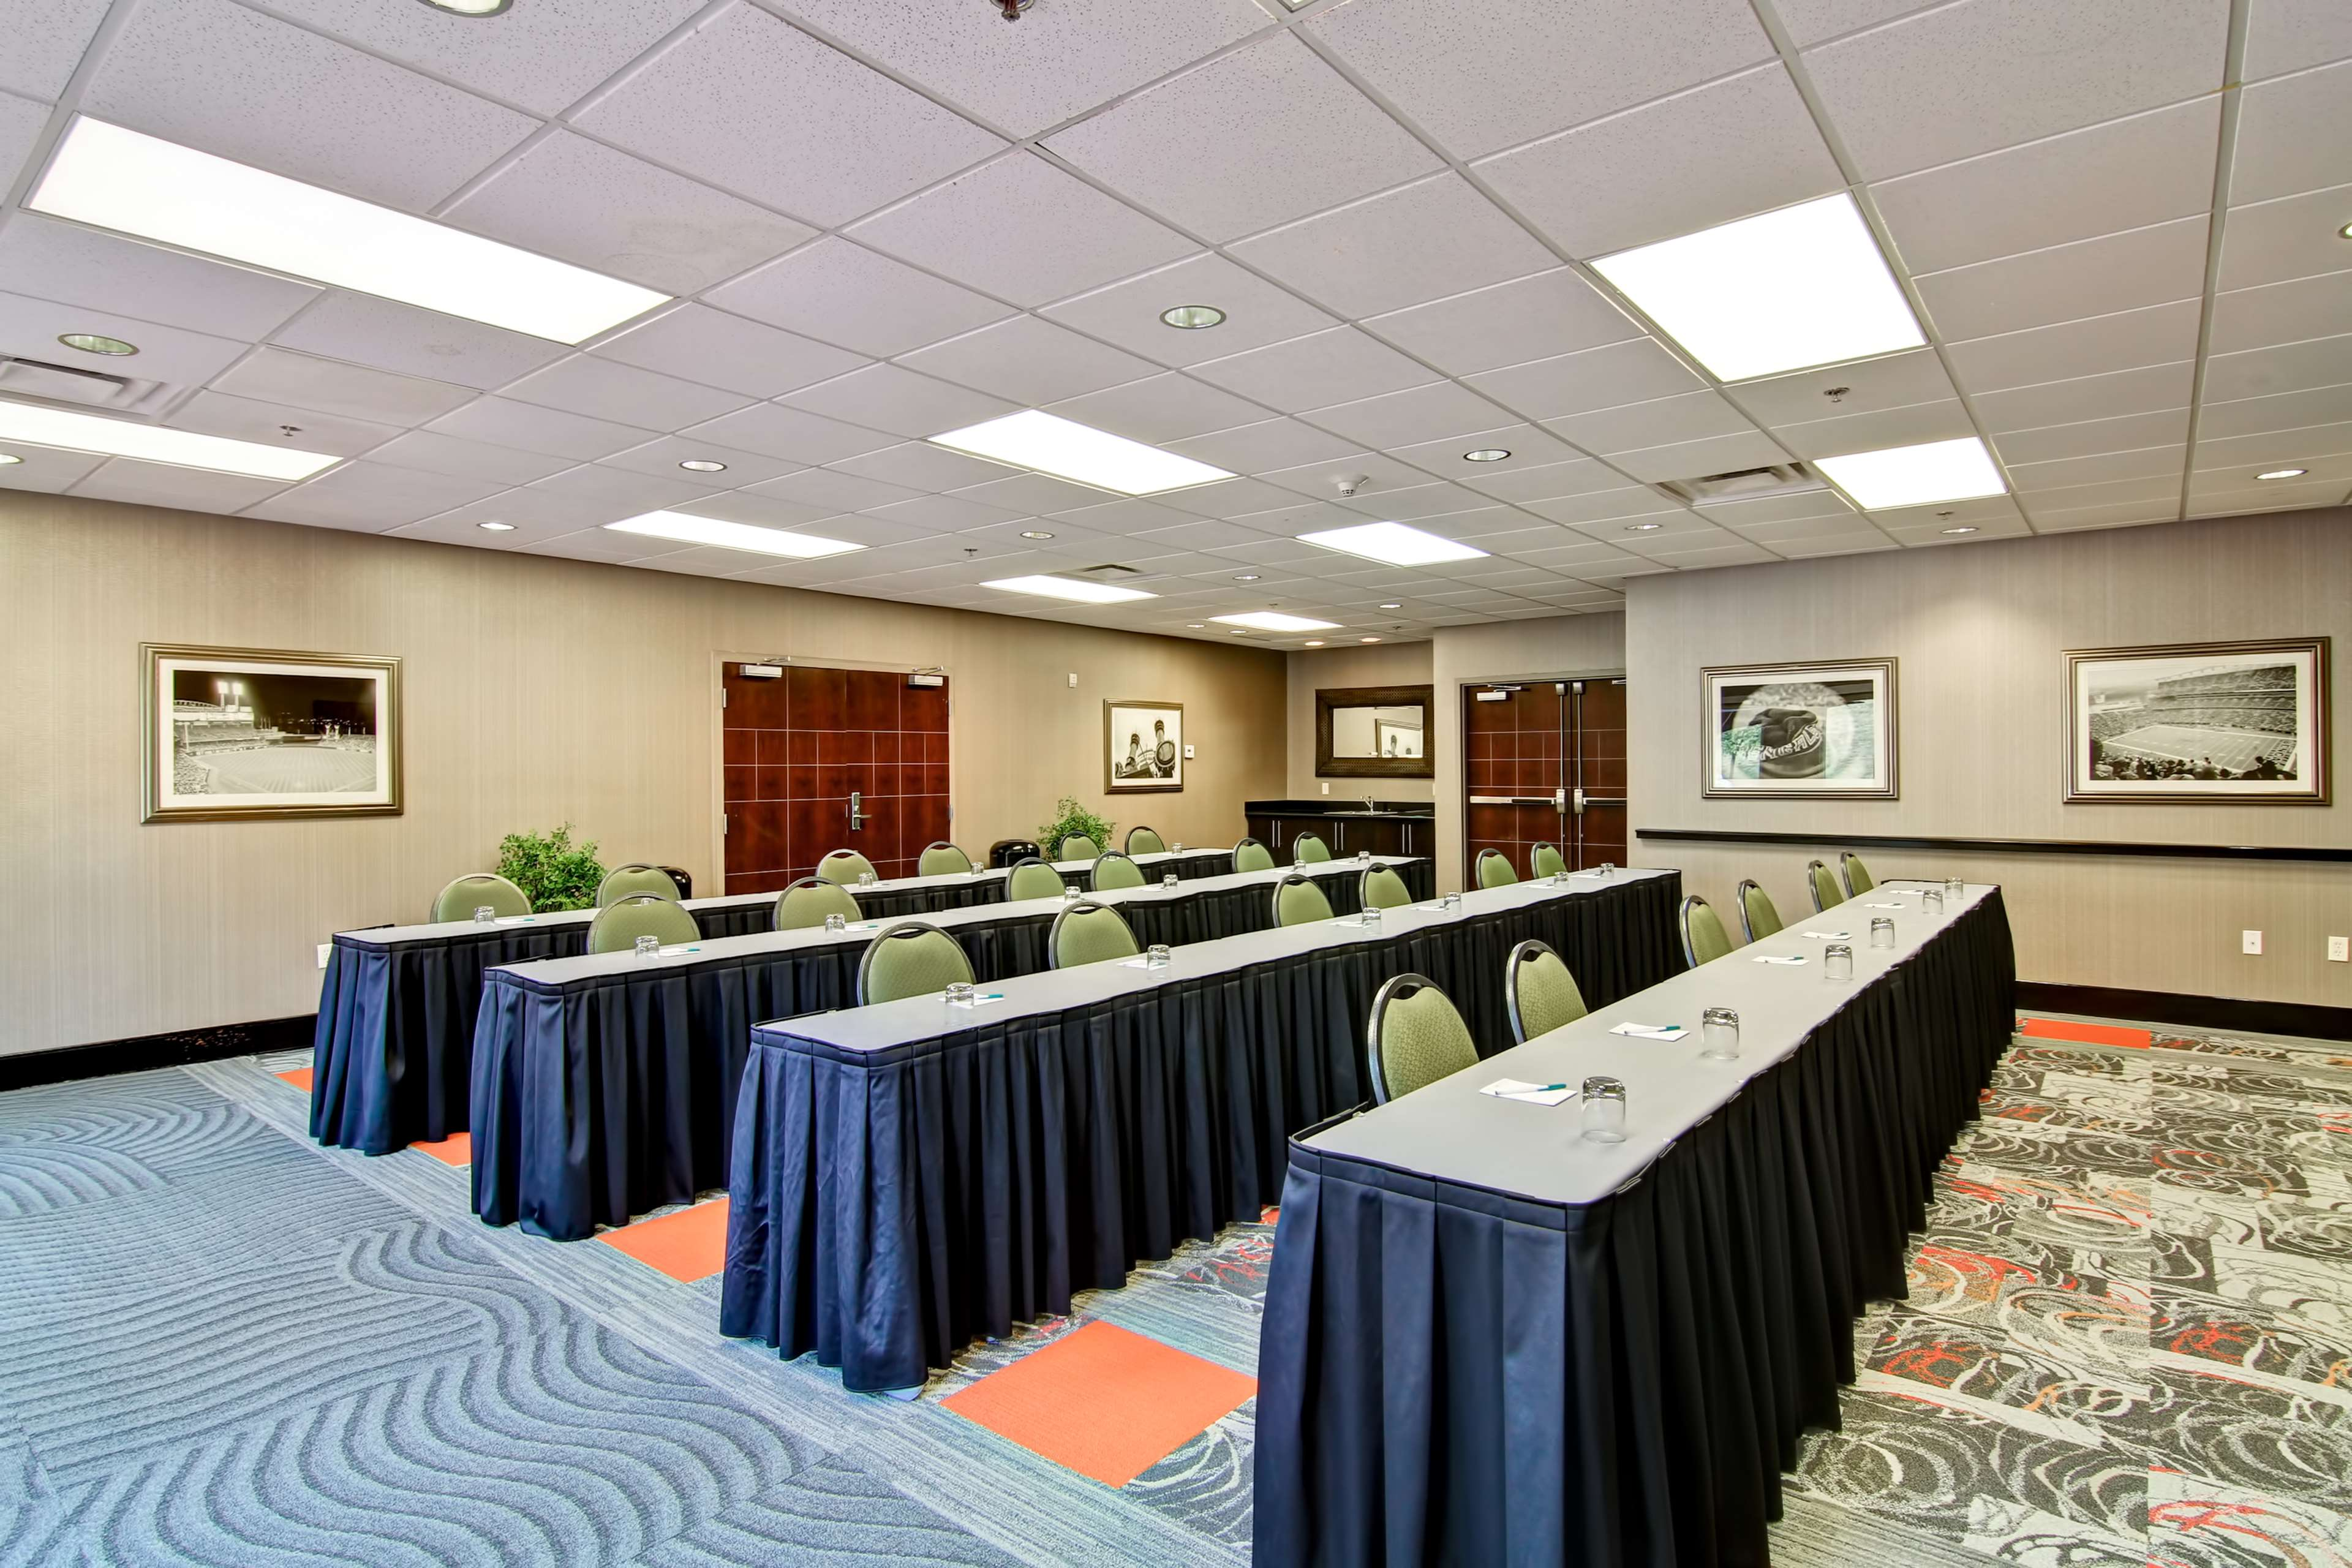 Homewood Suites by Hilton Cincinnati Airport South-Florence image 38